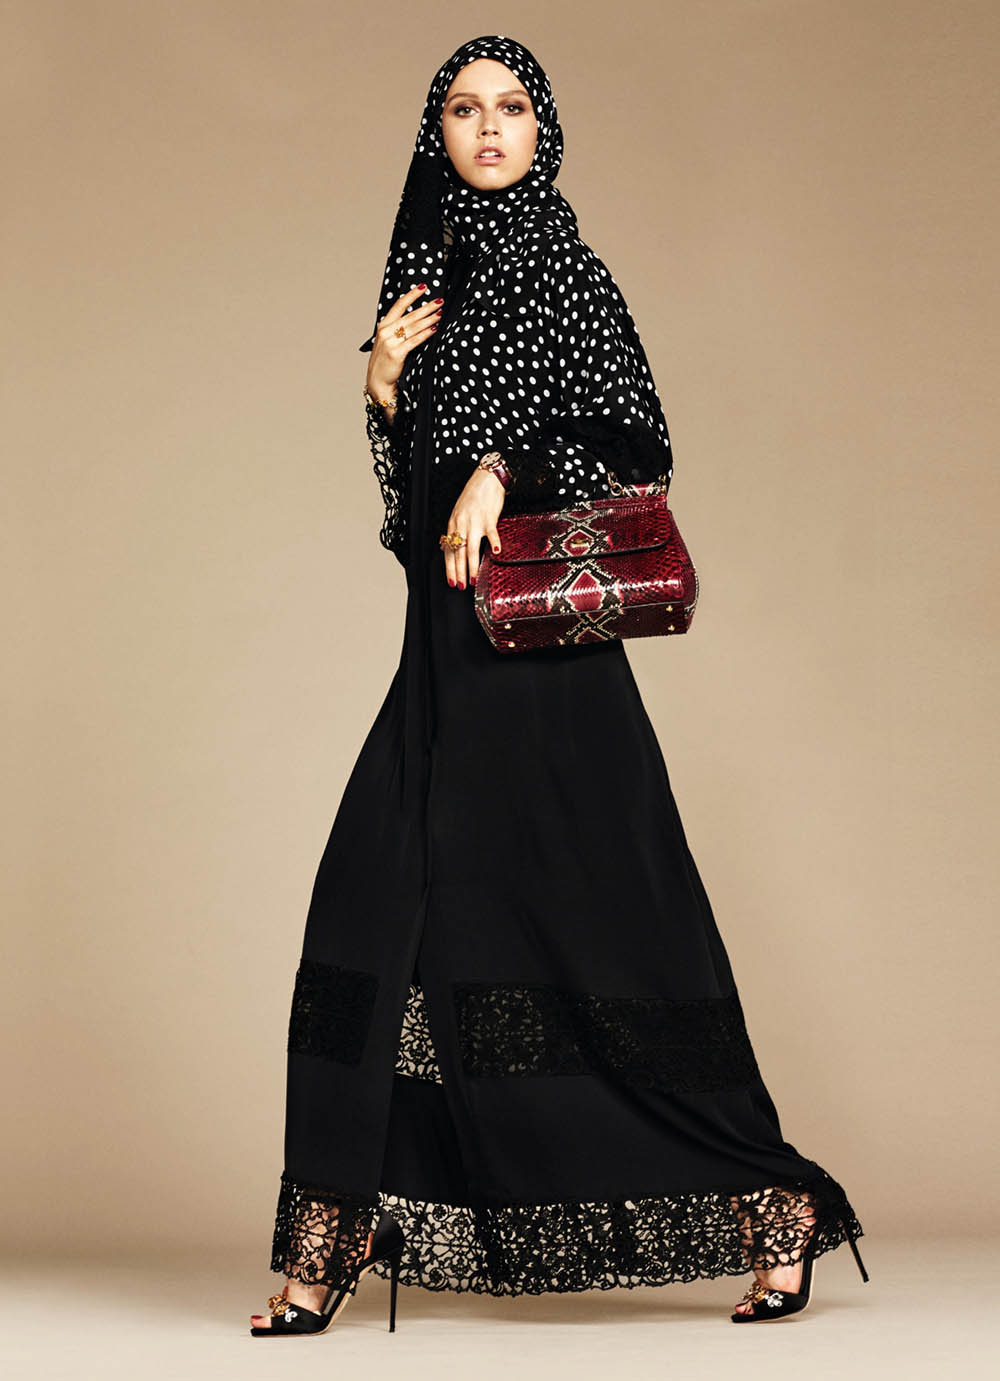 griot-mag-2-dolce-gabbana-hijab-abaja-velo-islam-5